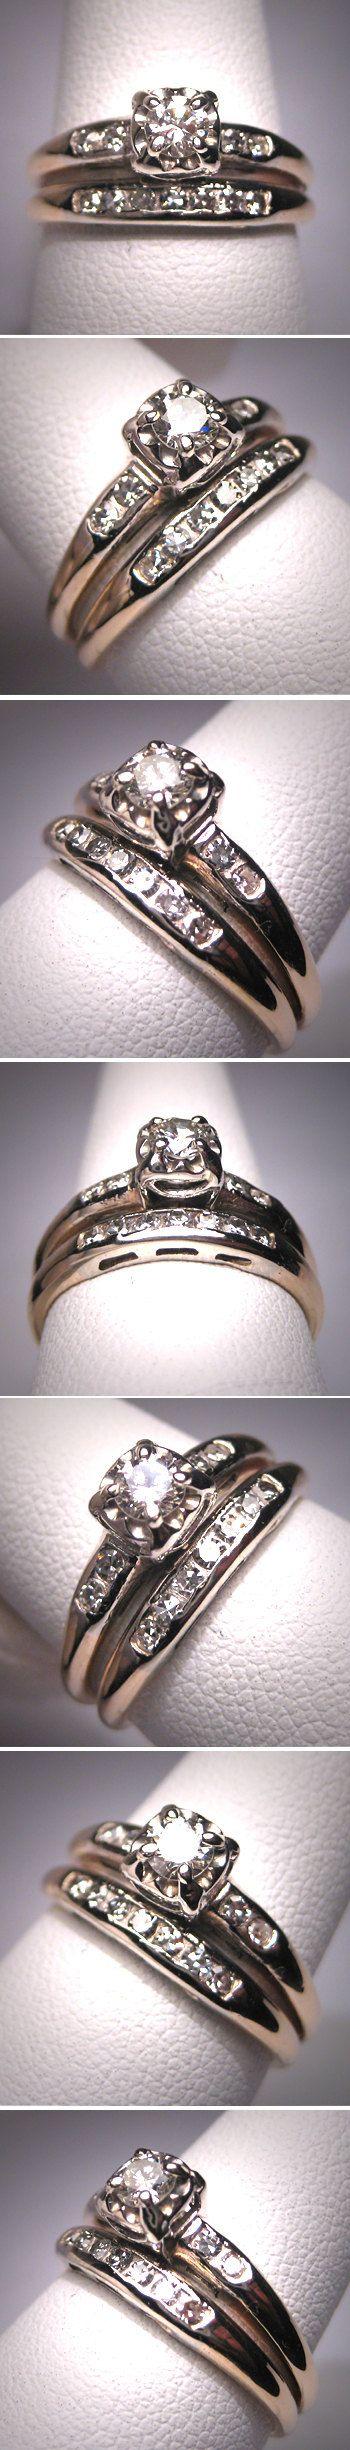 Memaw's??? Antique Diamond Wedding Ring Set Vintage Art by AawsombleiJewelry, $1850.00